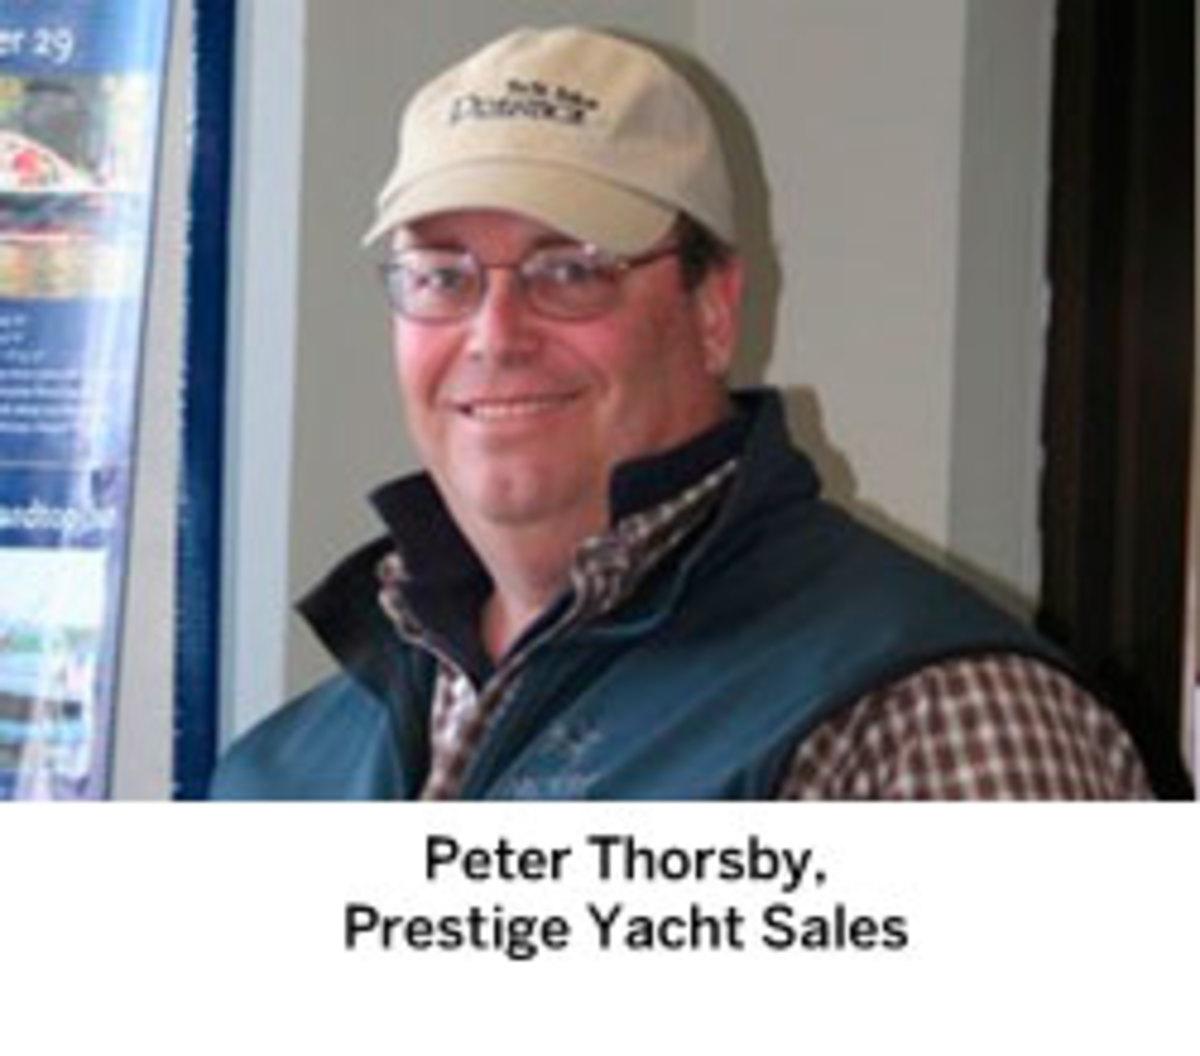 PeterThorsby